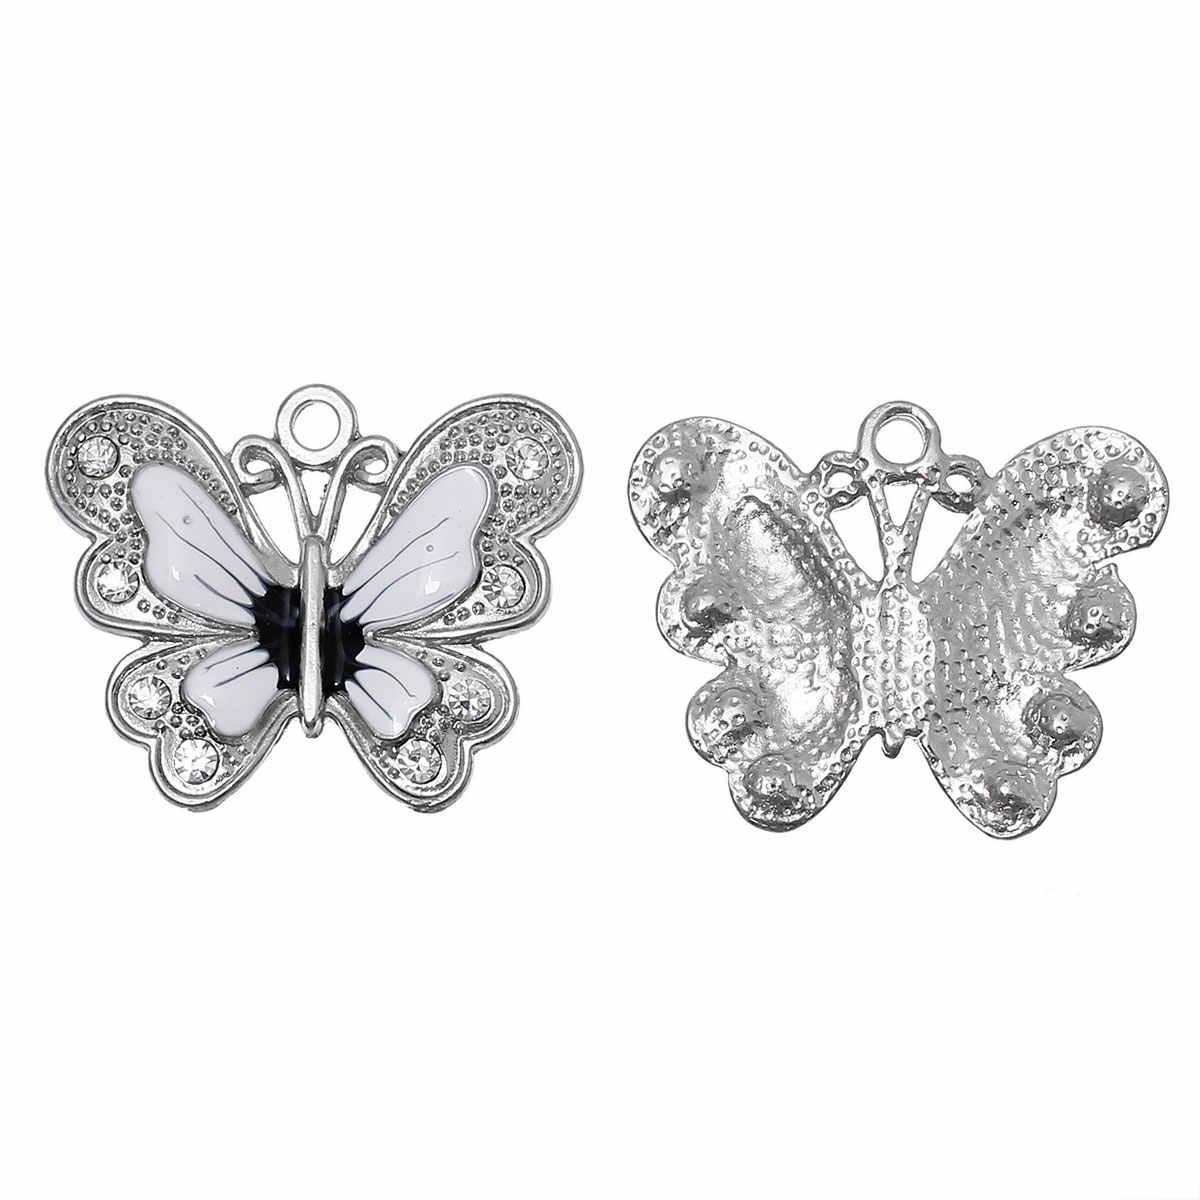 Doreenbeads Logam Seng Paduan Berlian Imitasi Pesona Liontin Butterfly Silver Warna Putih Bening Rhinestone Enamel 34 Mm X 27 Mm, 1 Pc